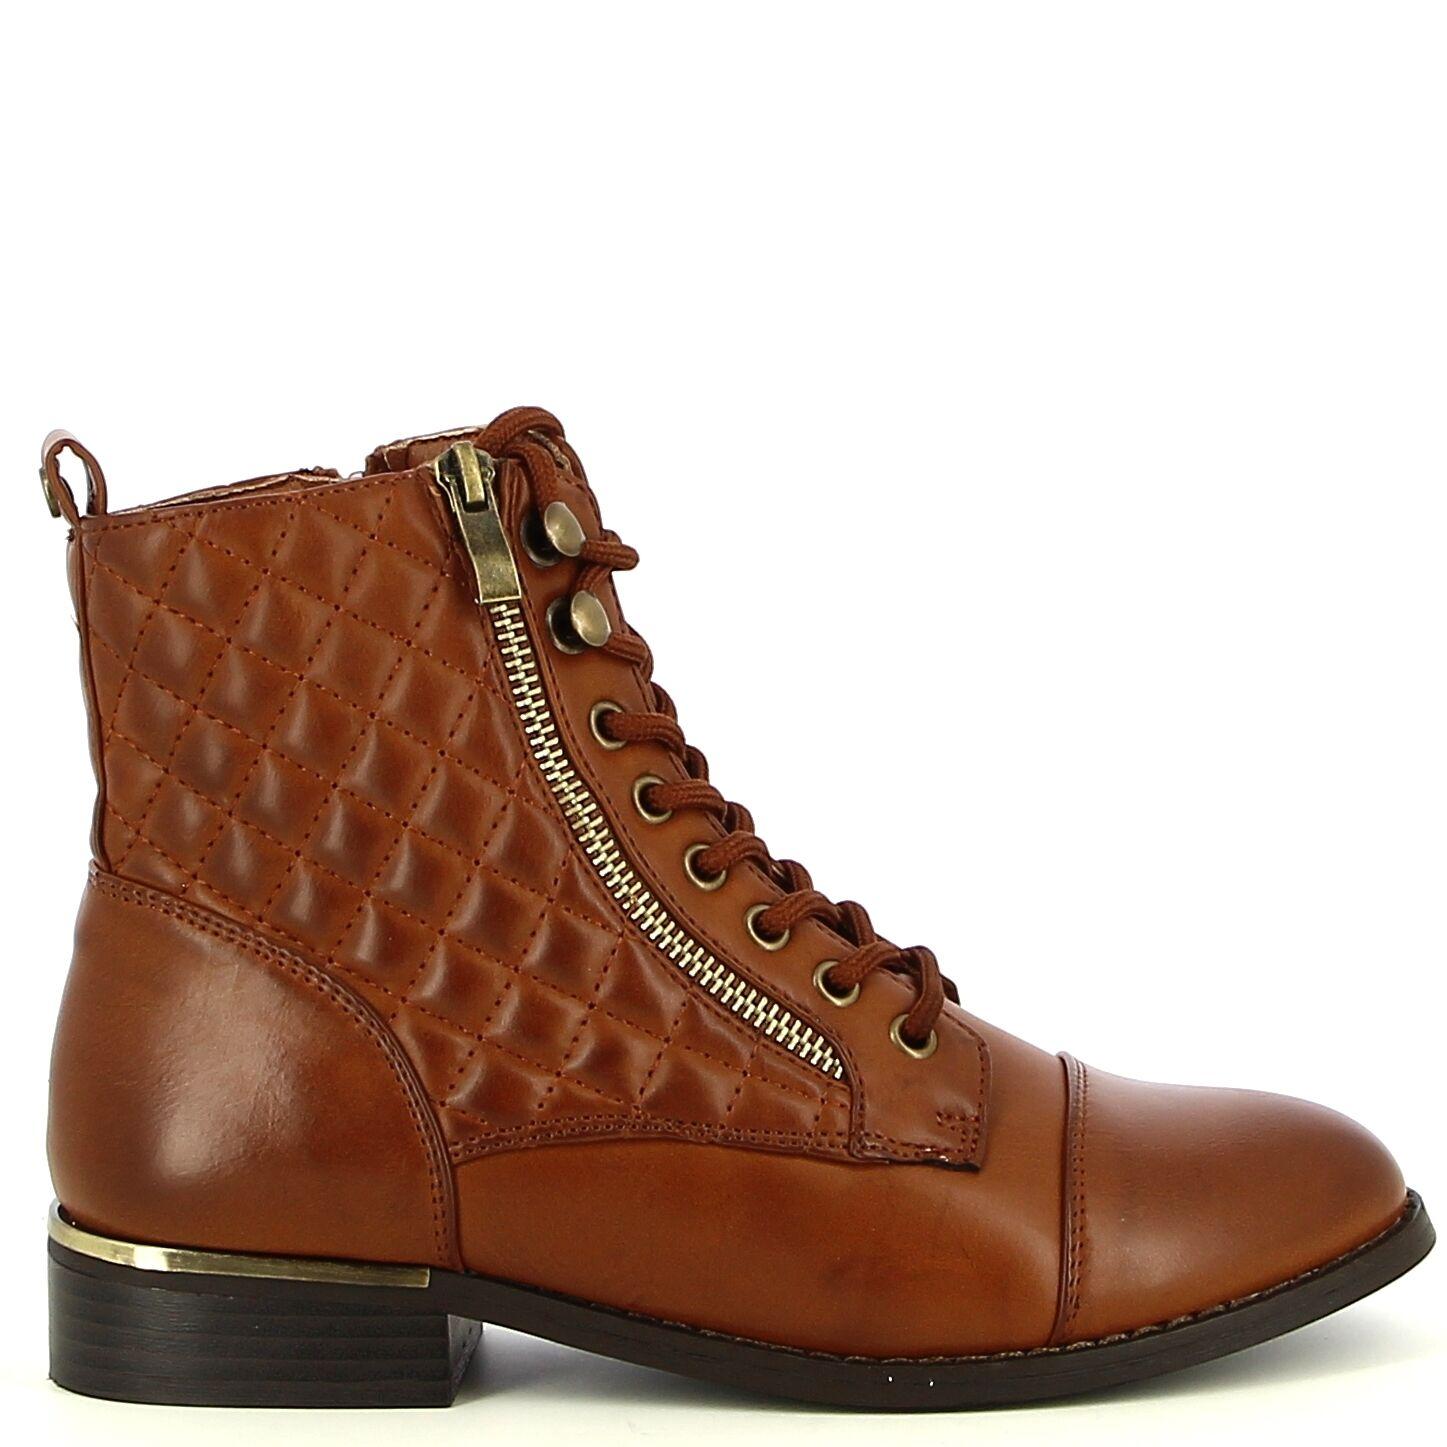 Ken Shoe Fashion - Camel - Boots